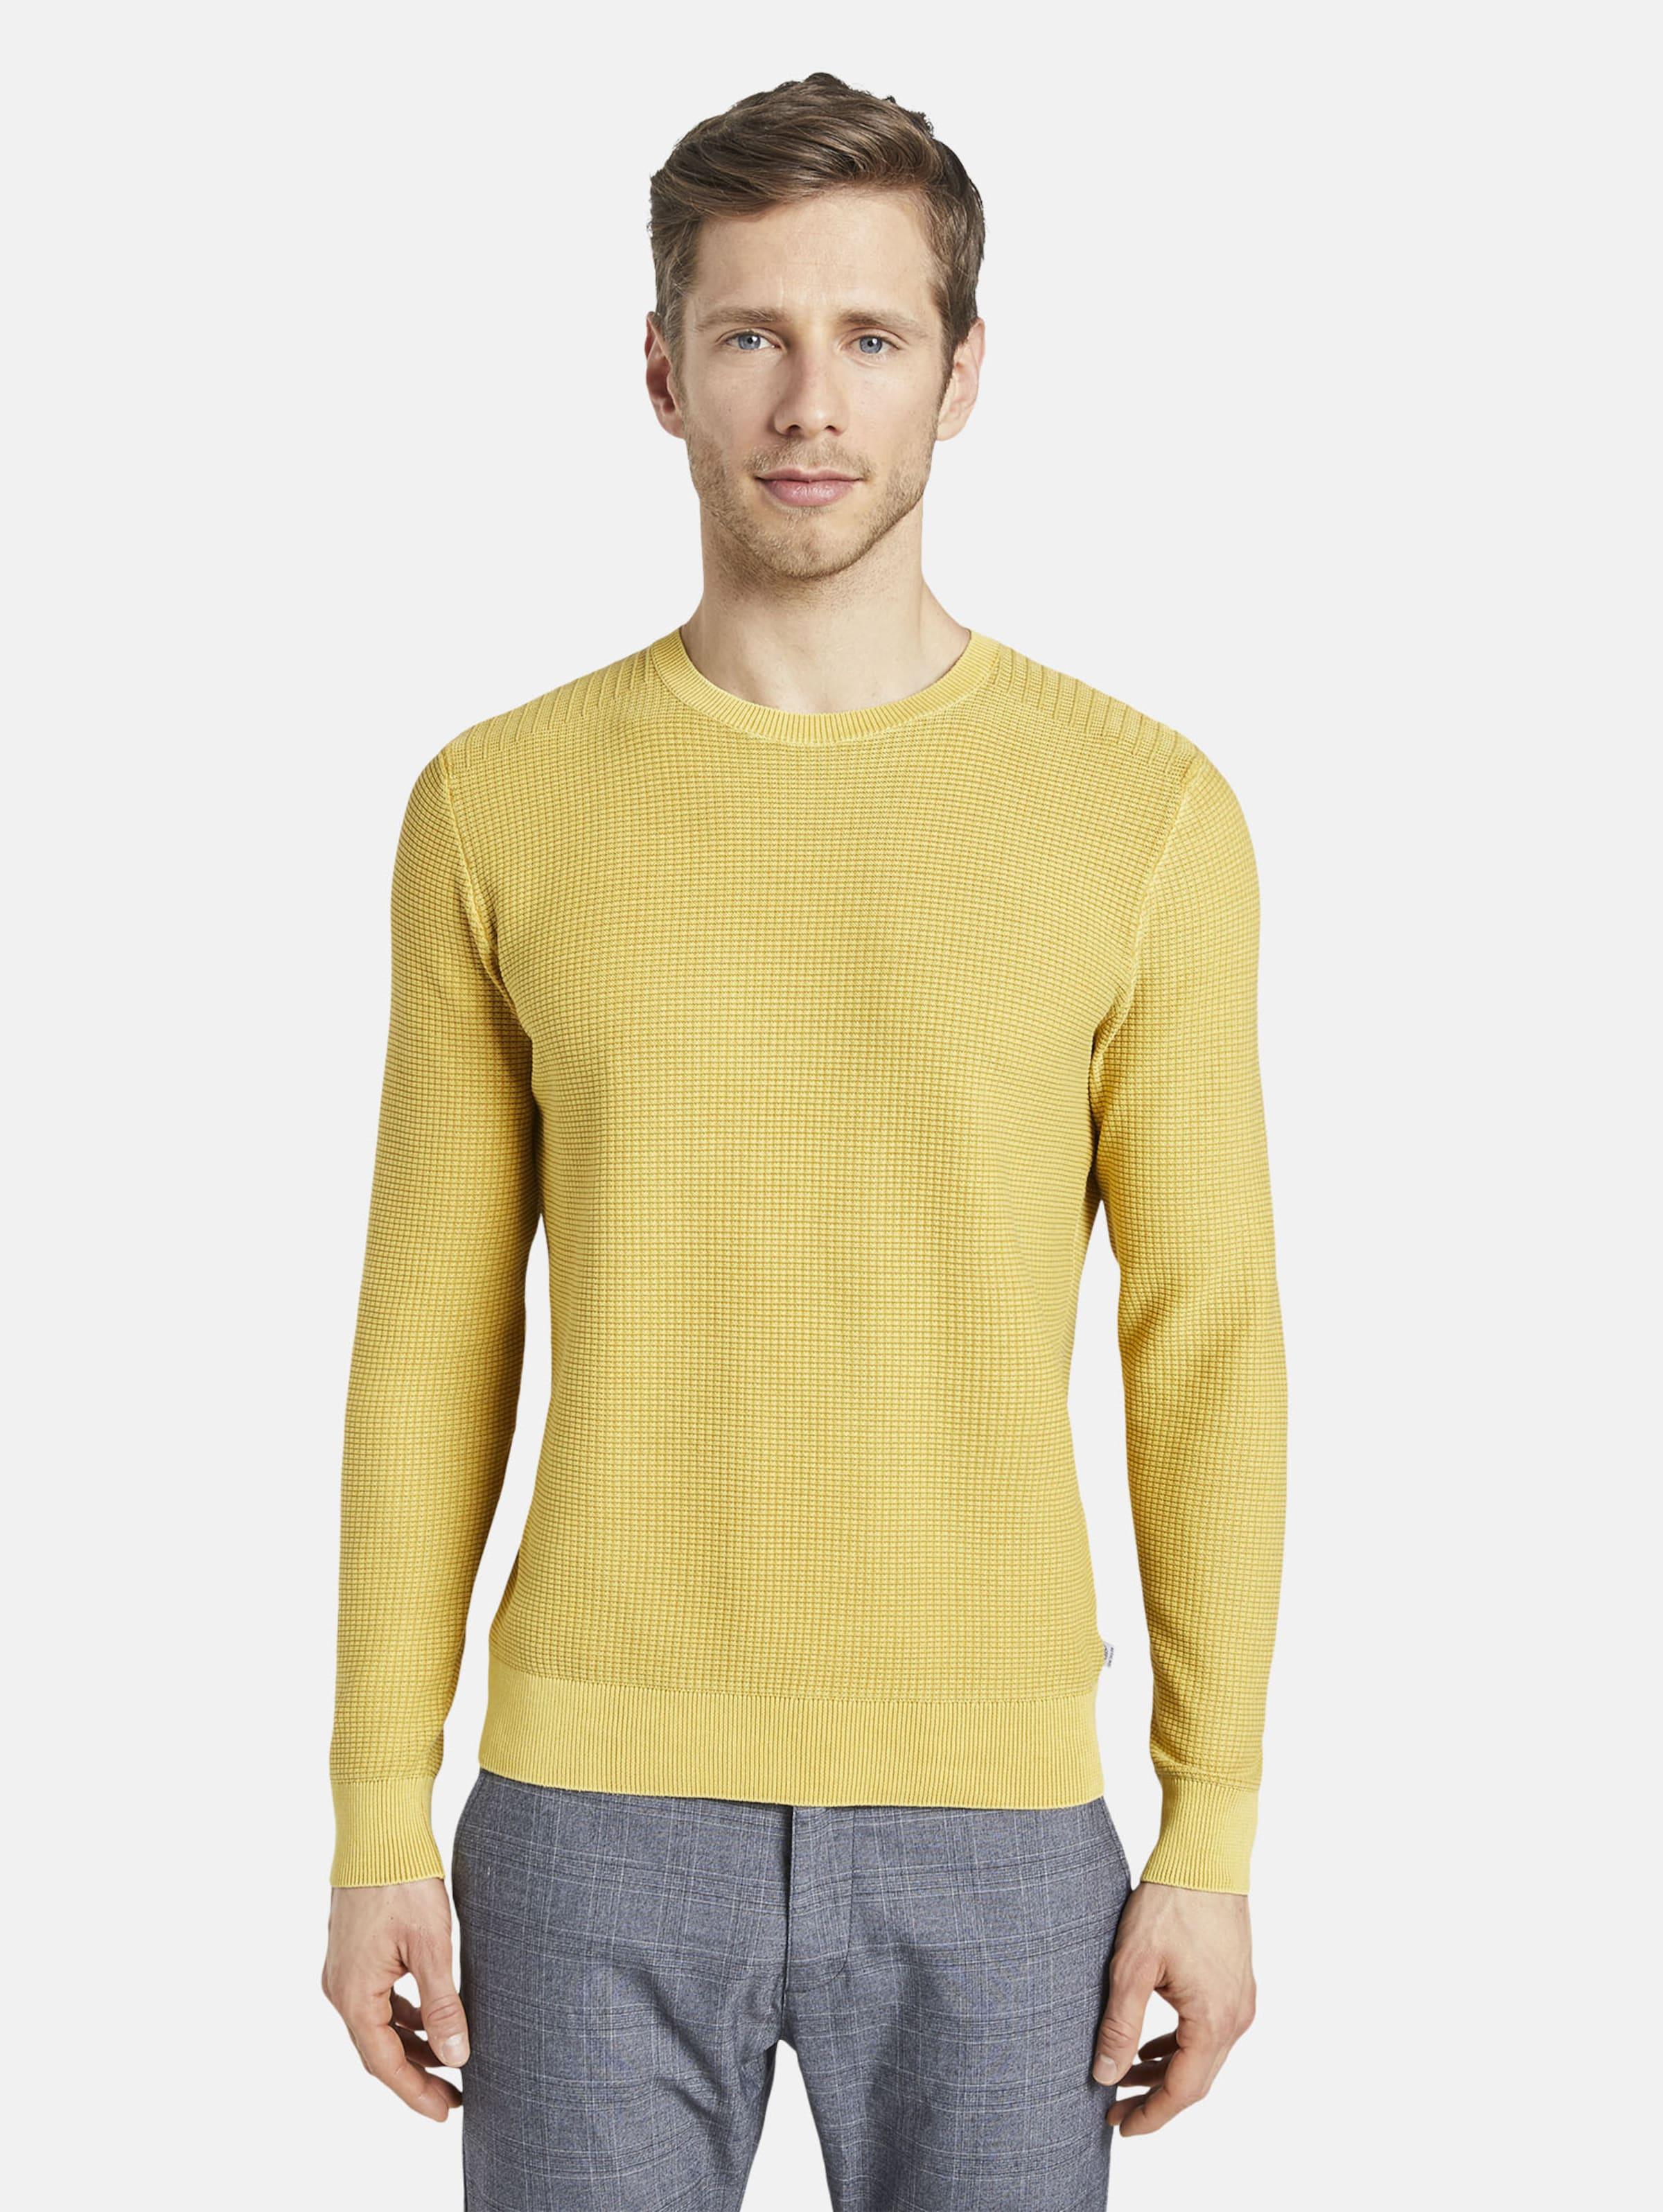 TOM TAILOR Sweater in gelb Unifarben 1017181009